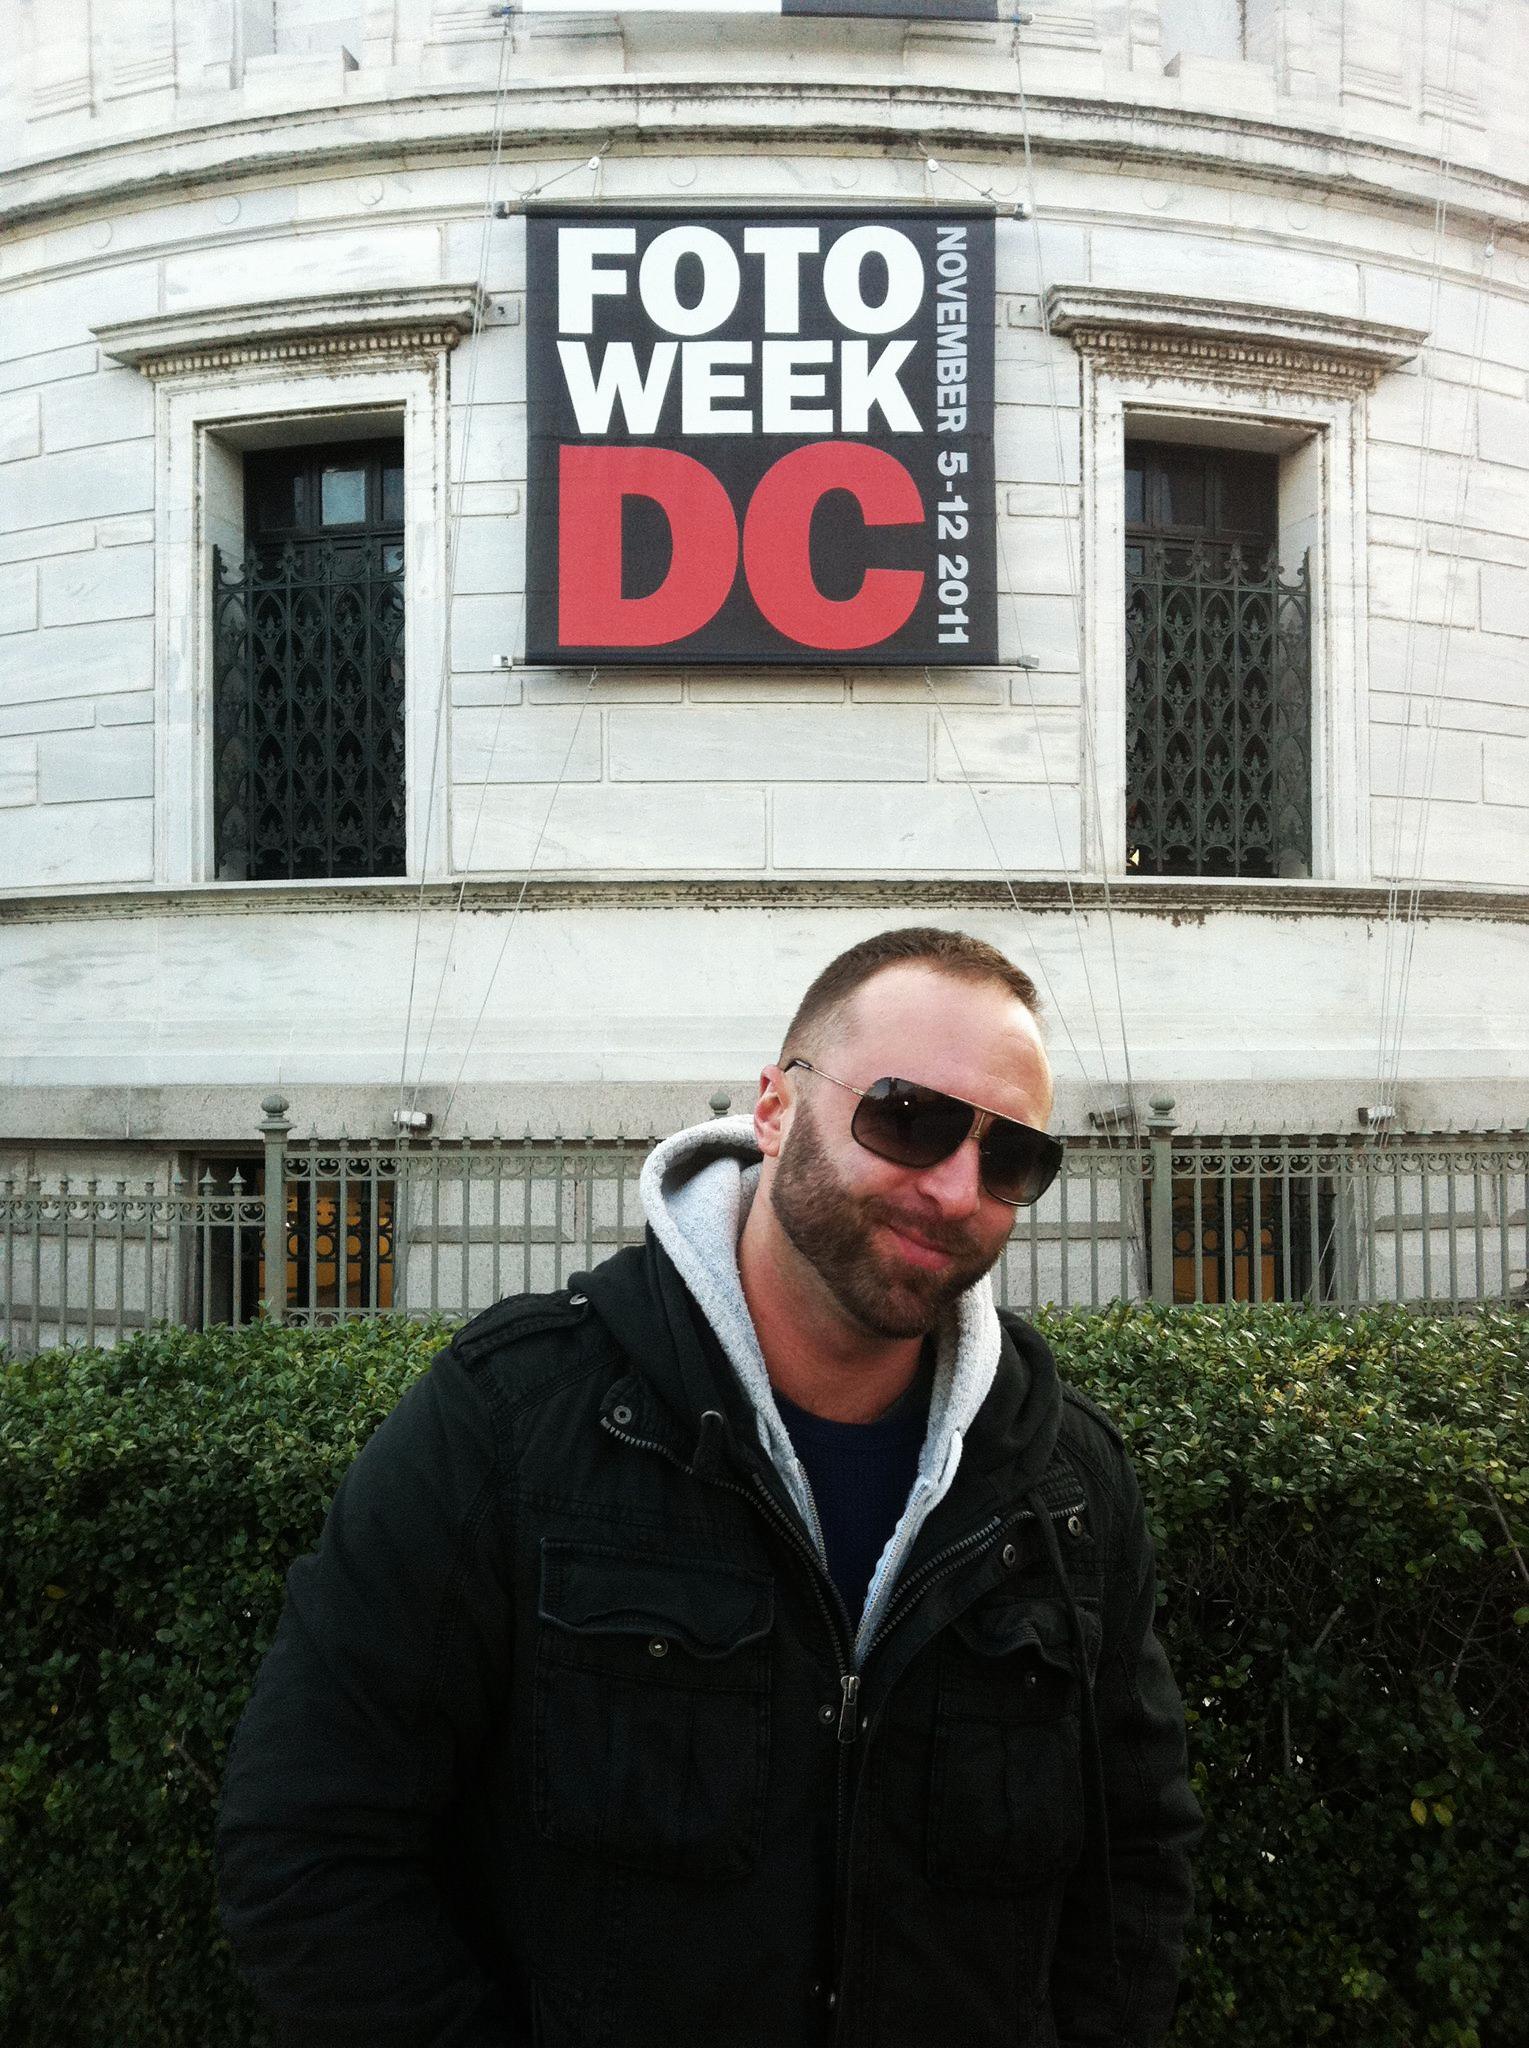 Photo displayed for Foto Week DC.